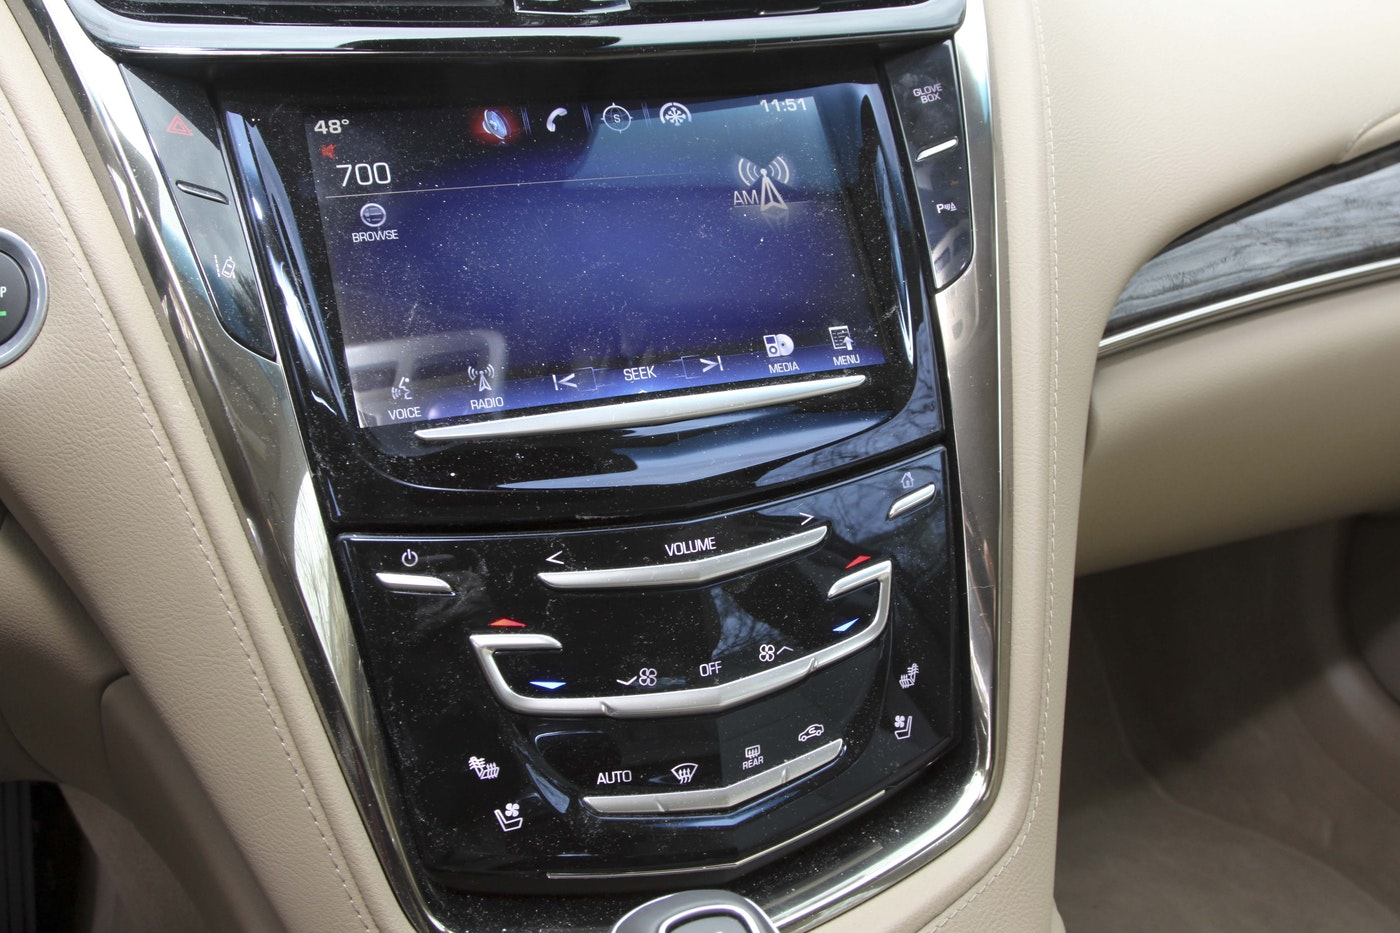 cadillac 2014 2 0l turbo cts 4 all wheel drive sedan ebth. Black Bedroom Furniture Sets. Home Design Ideas